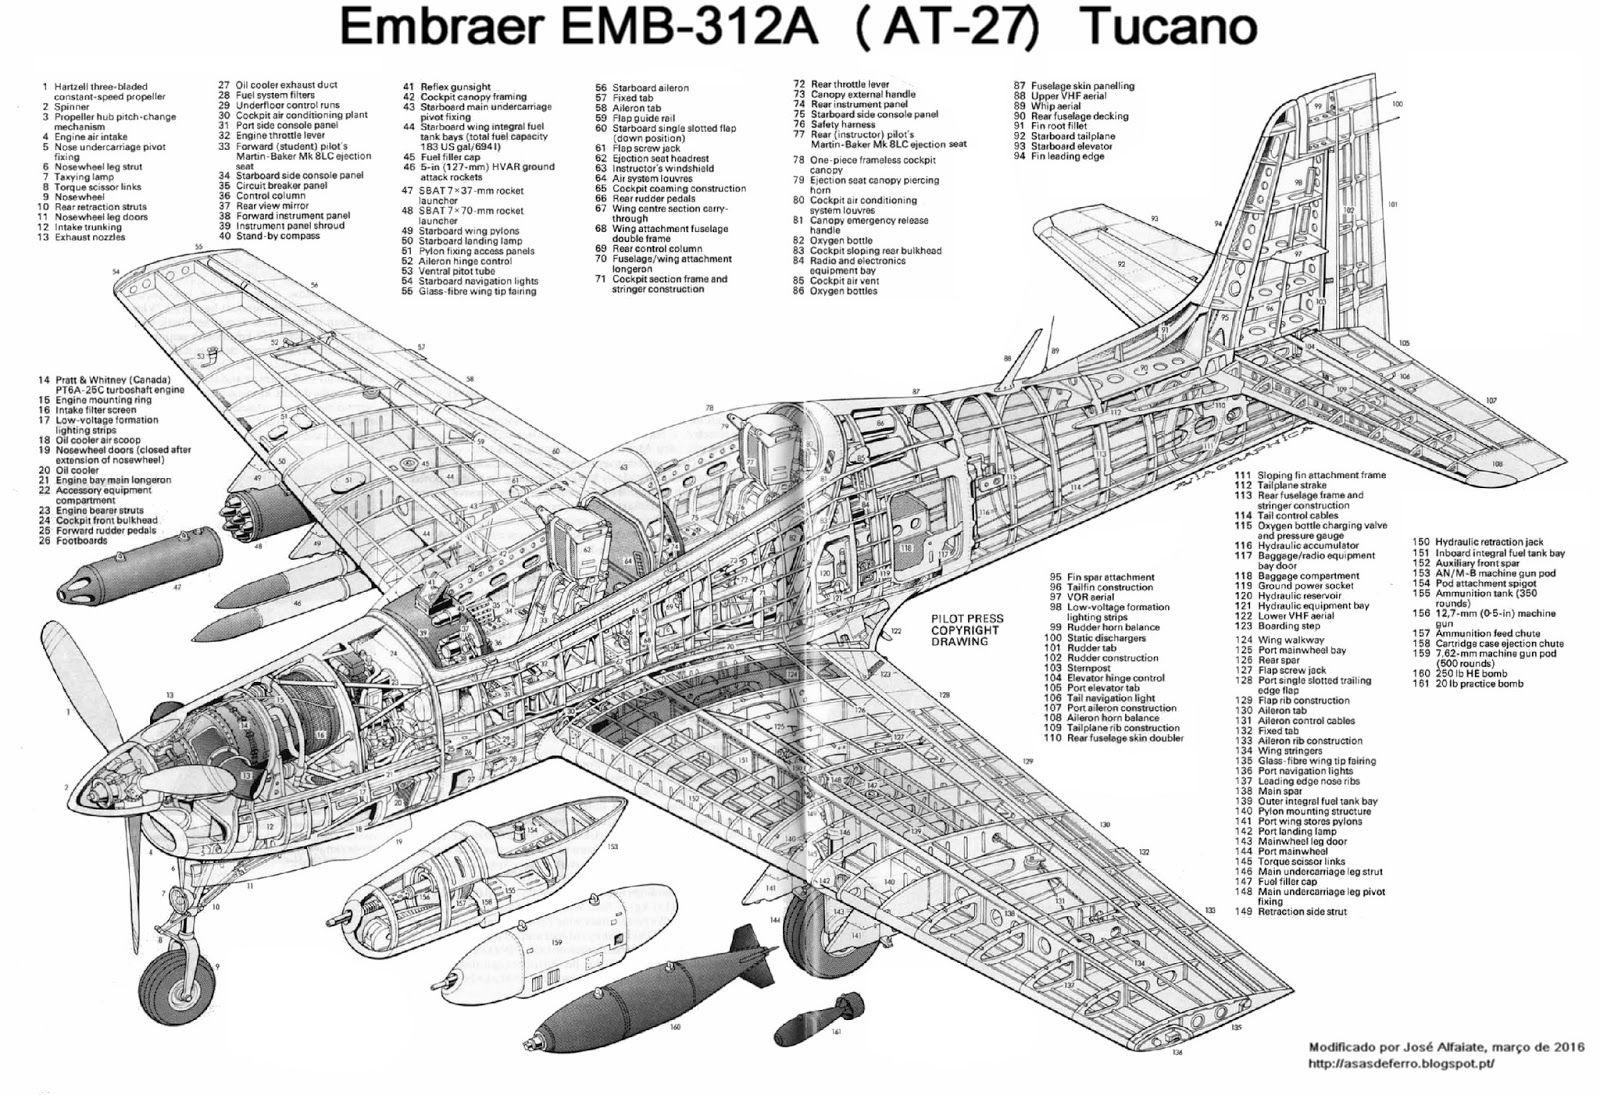 O Embraer T 27 Tucano Emb 312 De Concecao Brasileira E